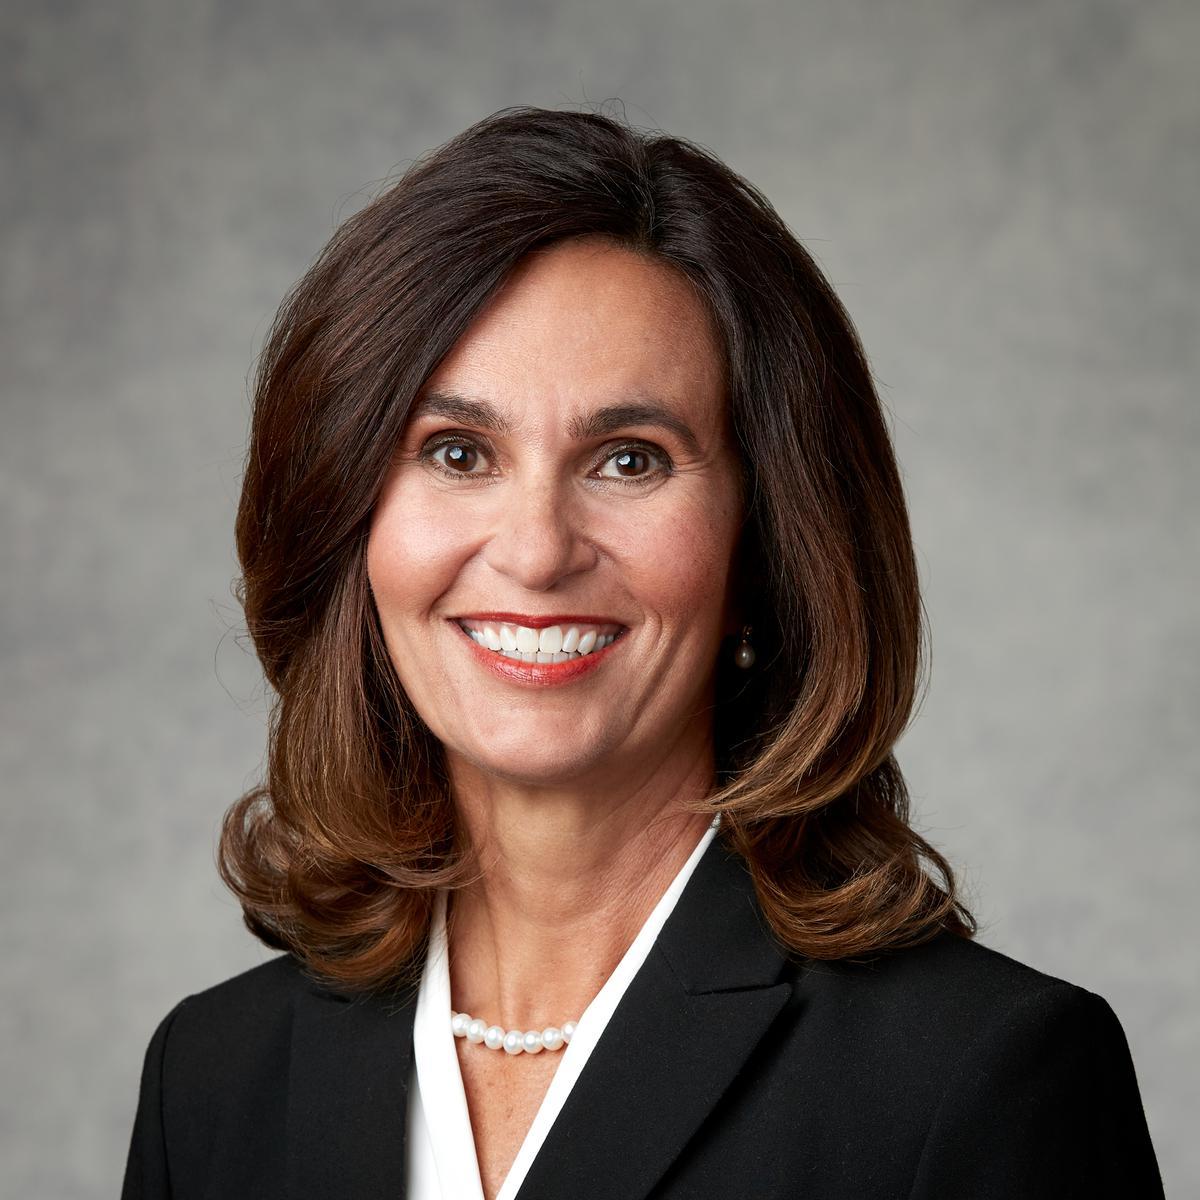 Lisa L. Harkness